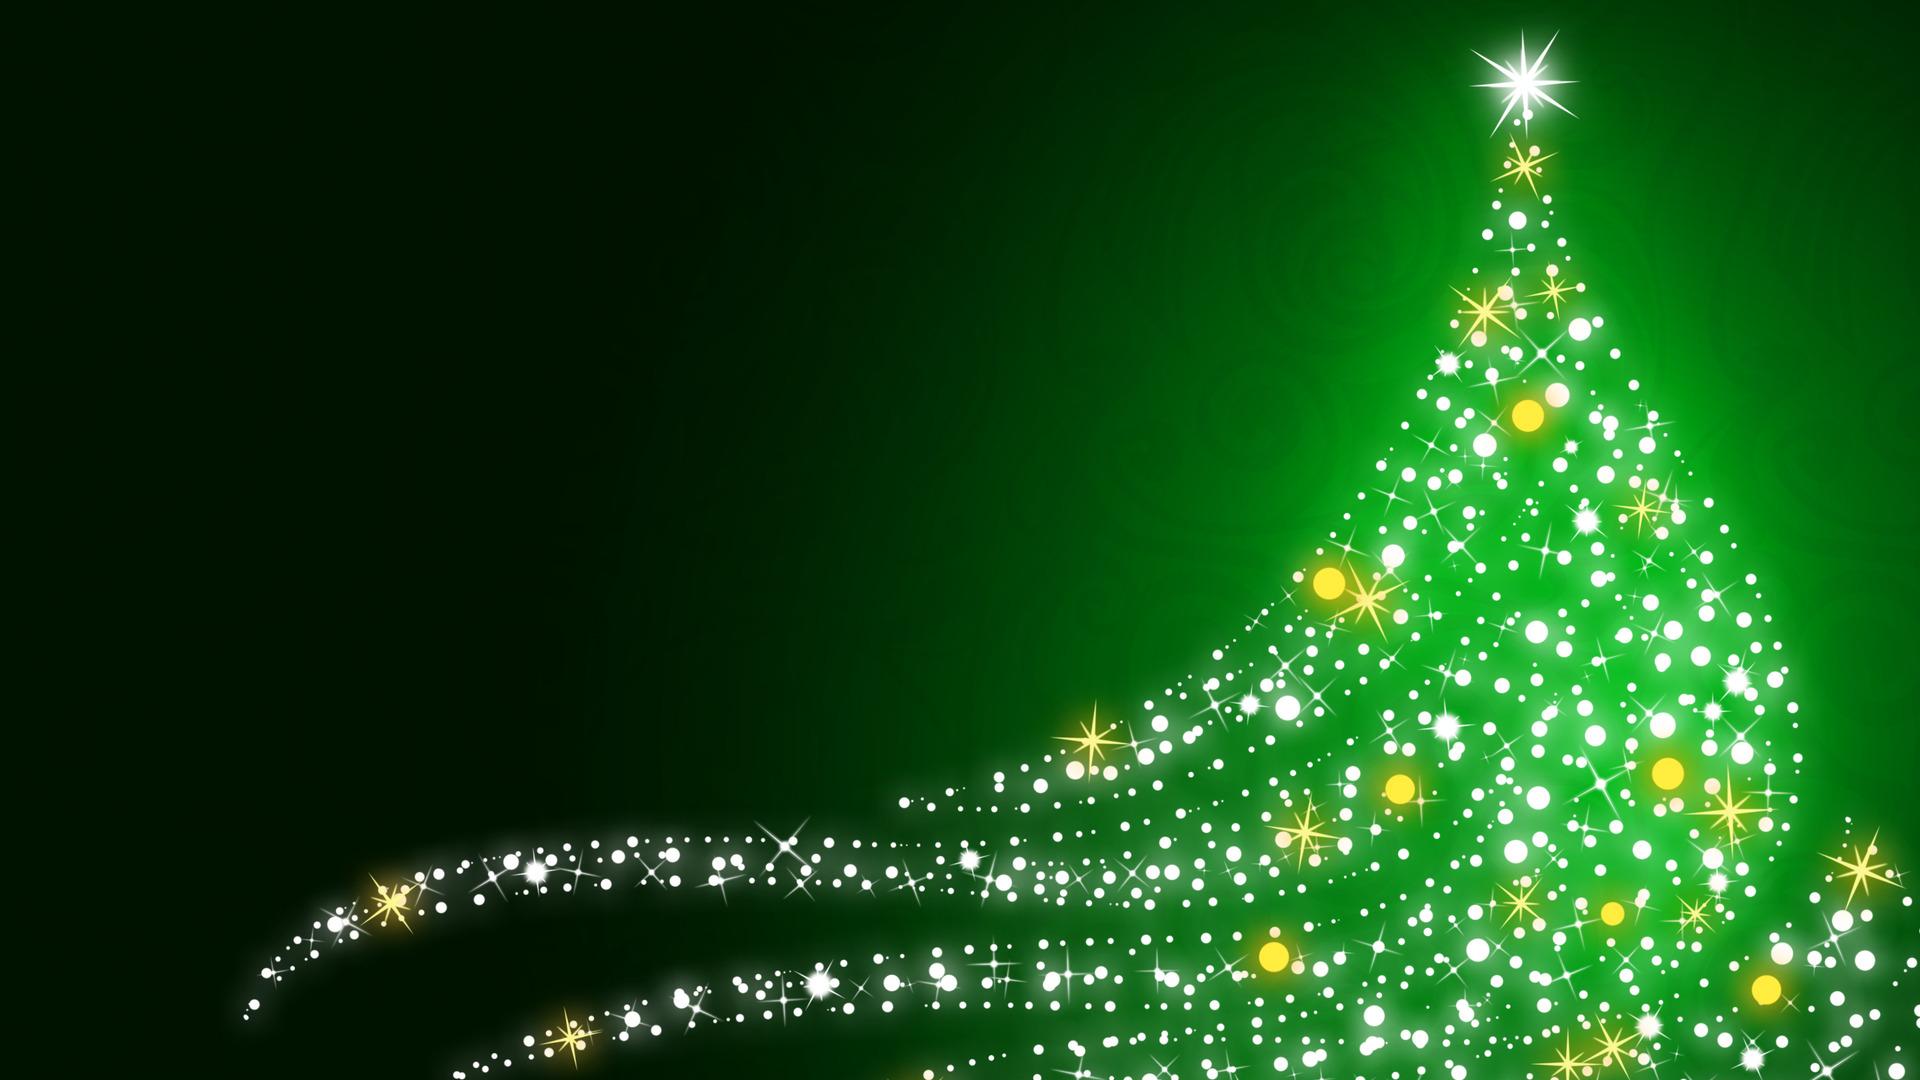 Christmas-wallpaper-wp3803790